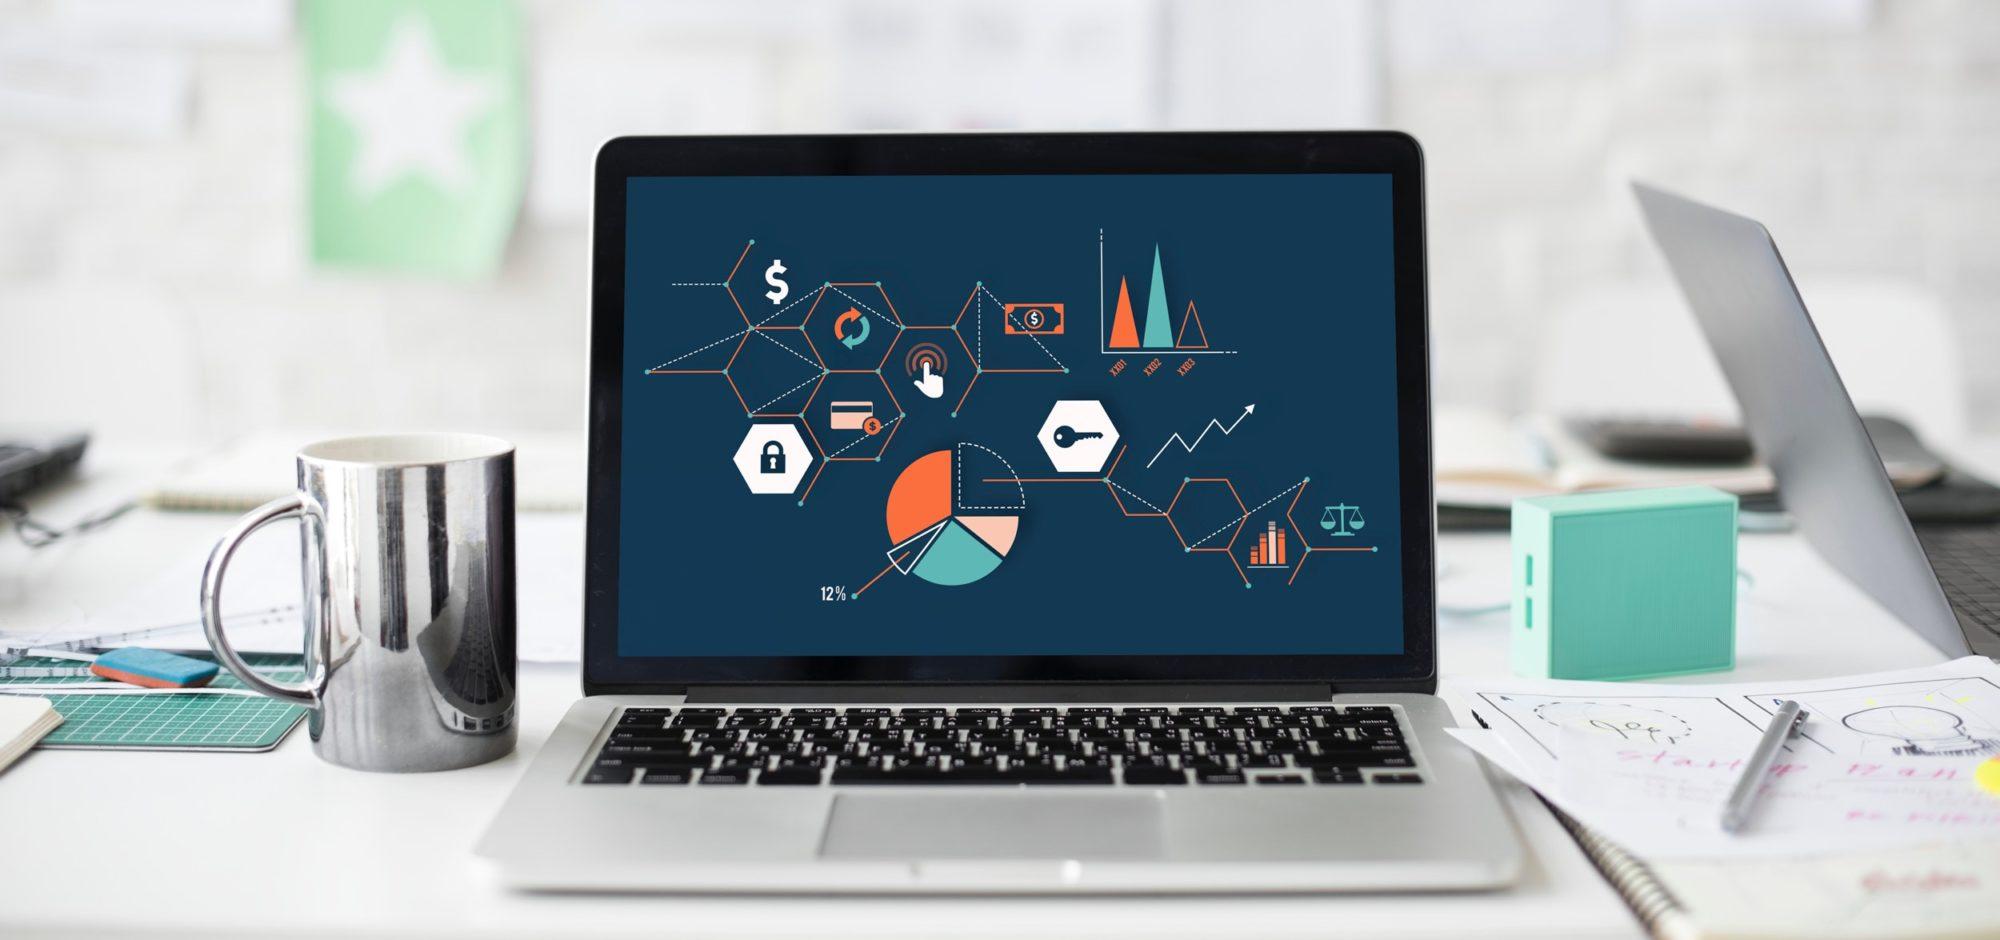 New Metrics & Capsim Bring Business Simulations to Oman | New Metrics